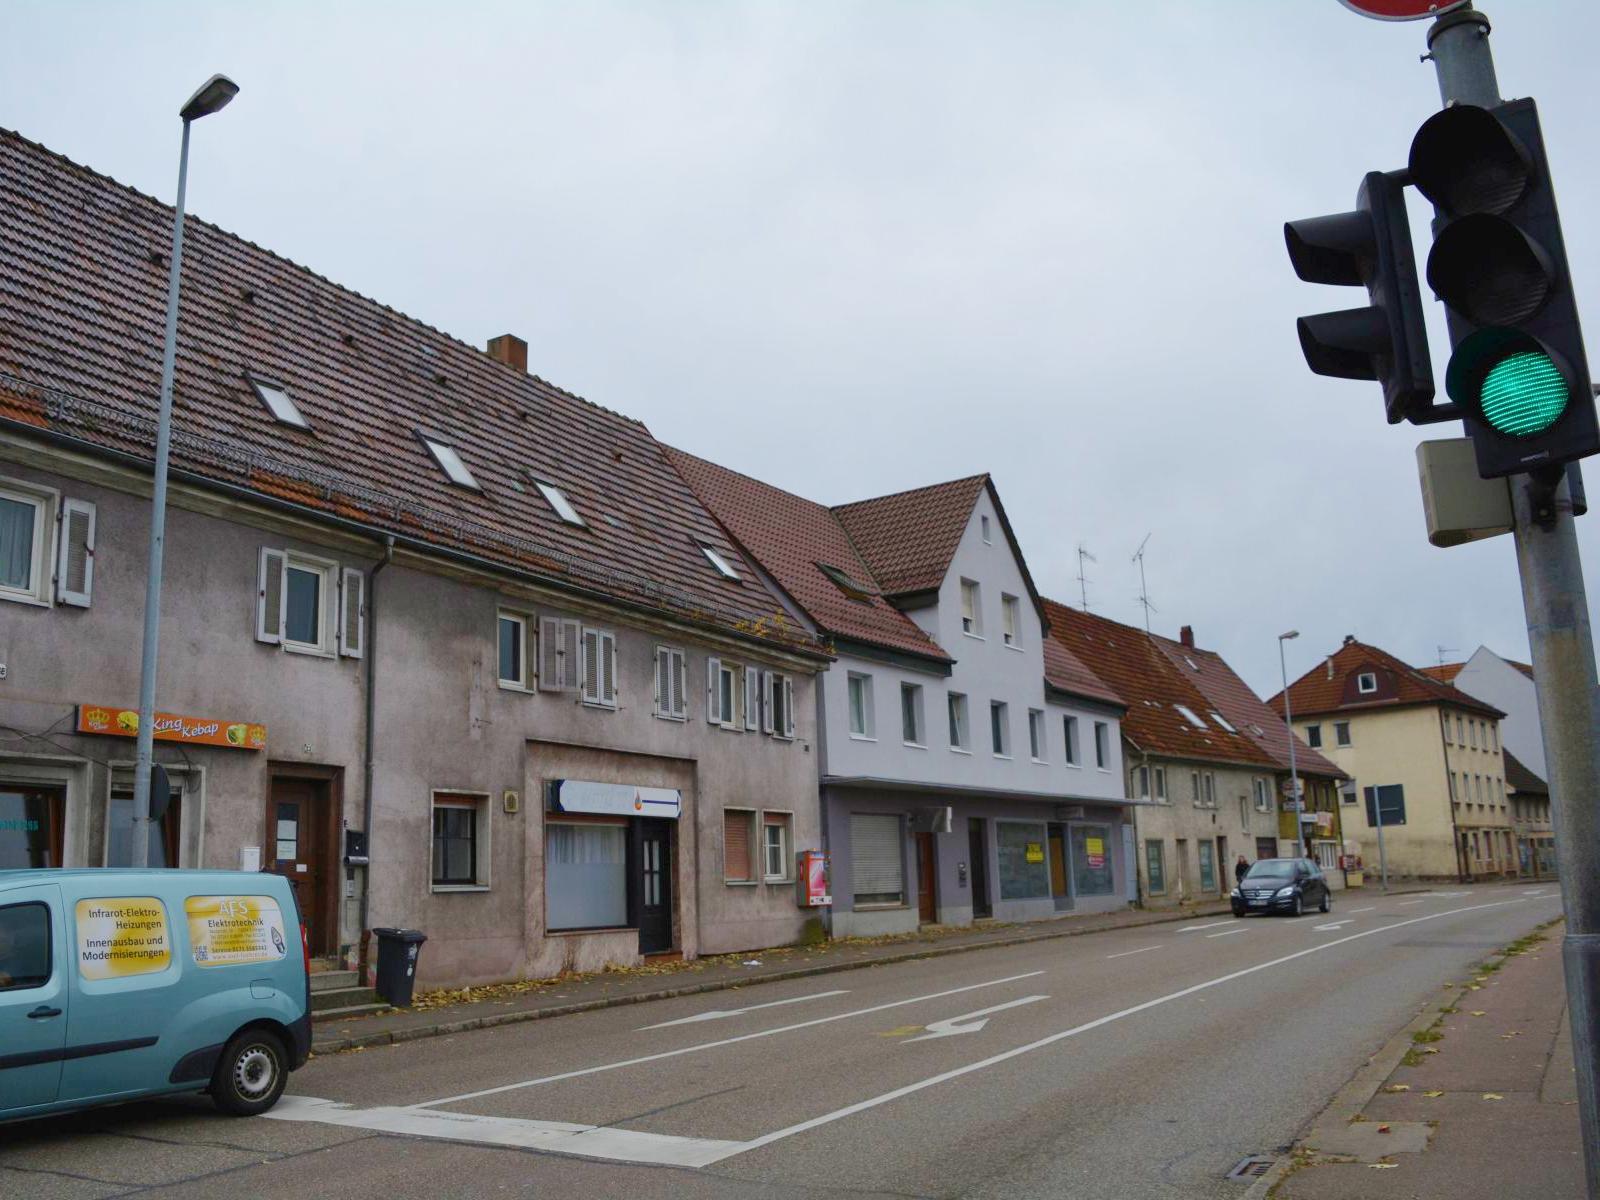 Leerstandsschwerpunkt Stuttgarter Straße